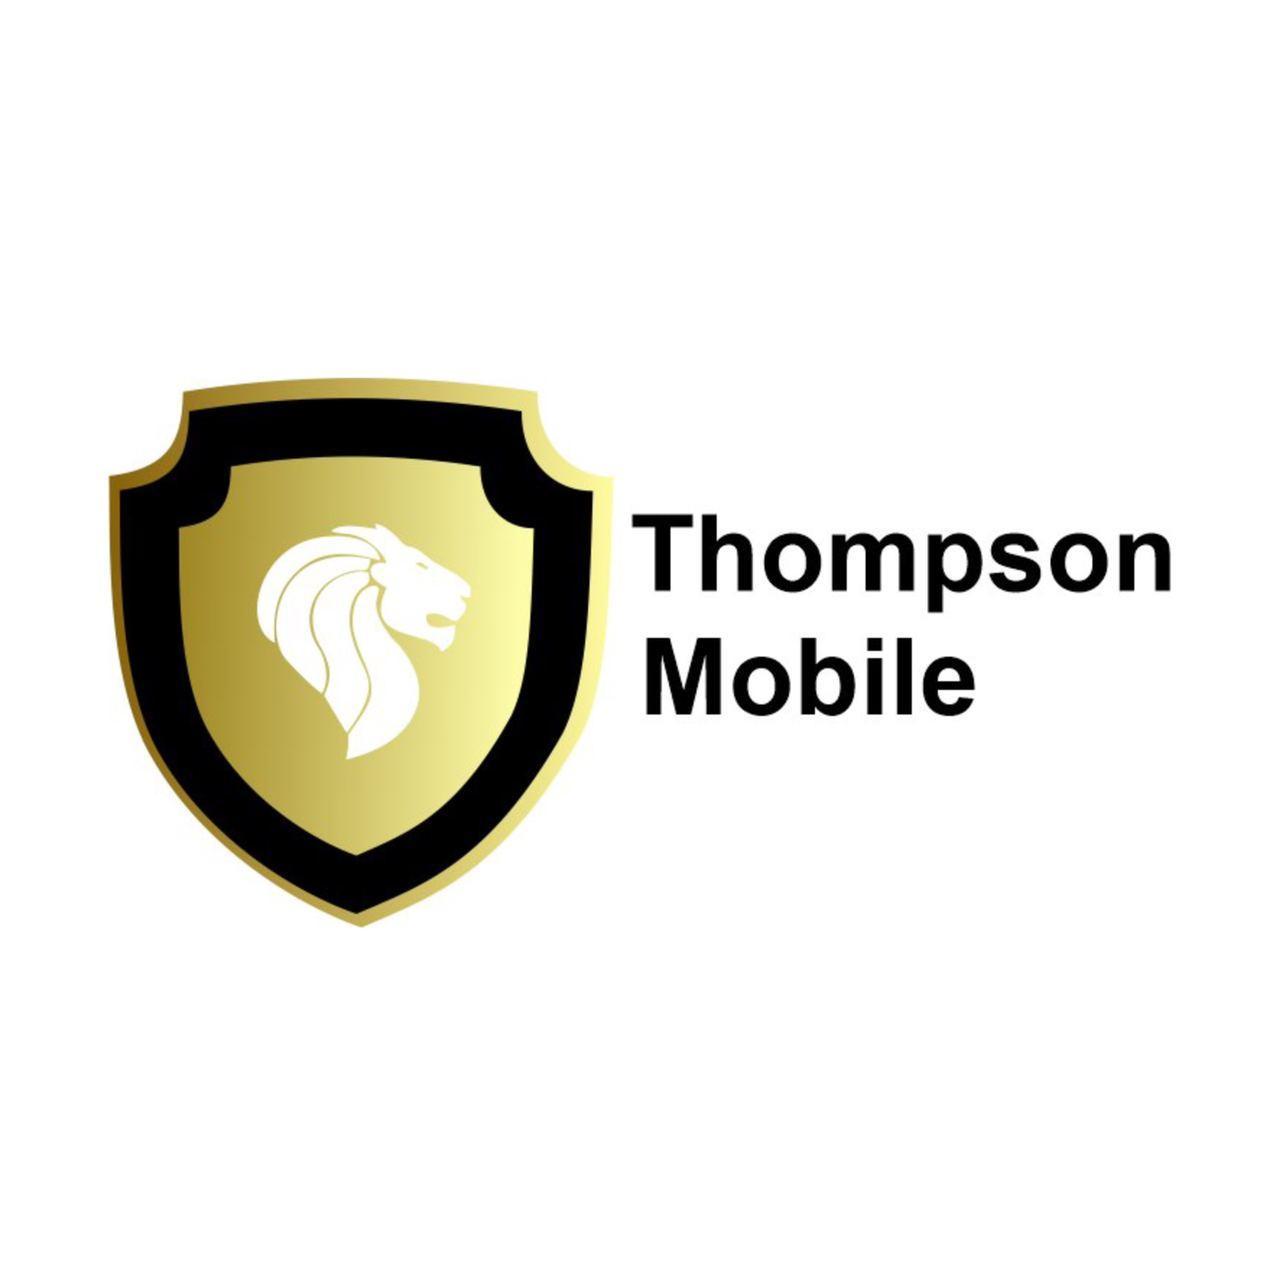 Thompson mobile